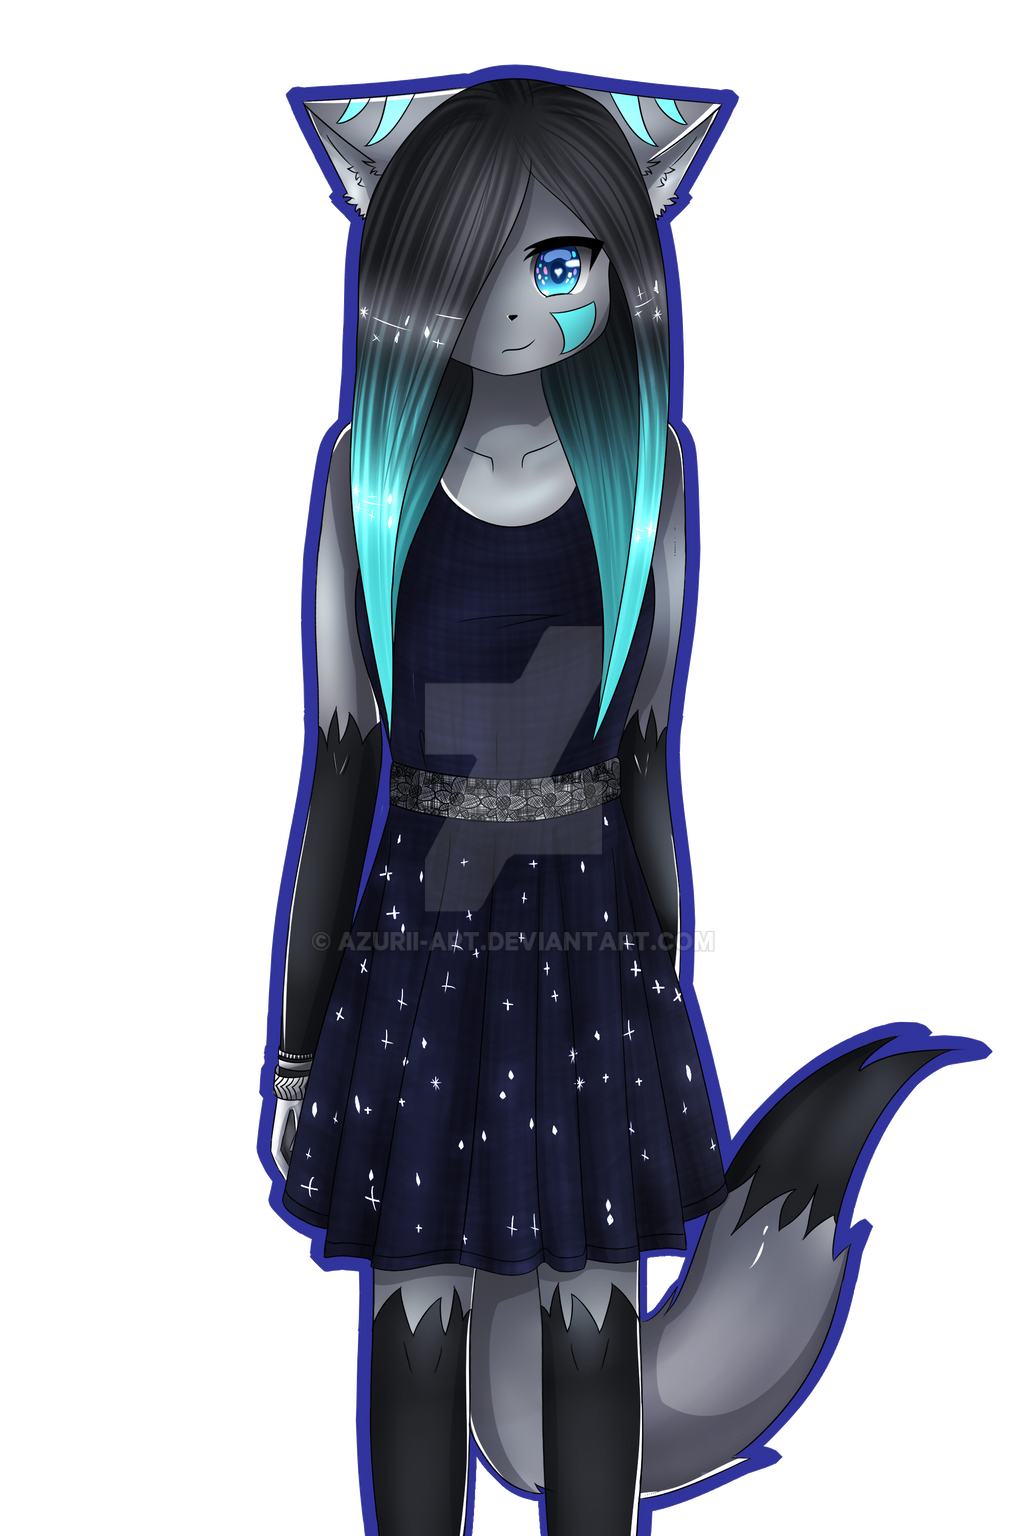 Azurii in Black Dress by Azurii-art